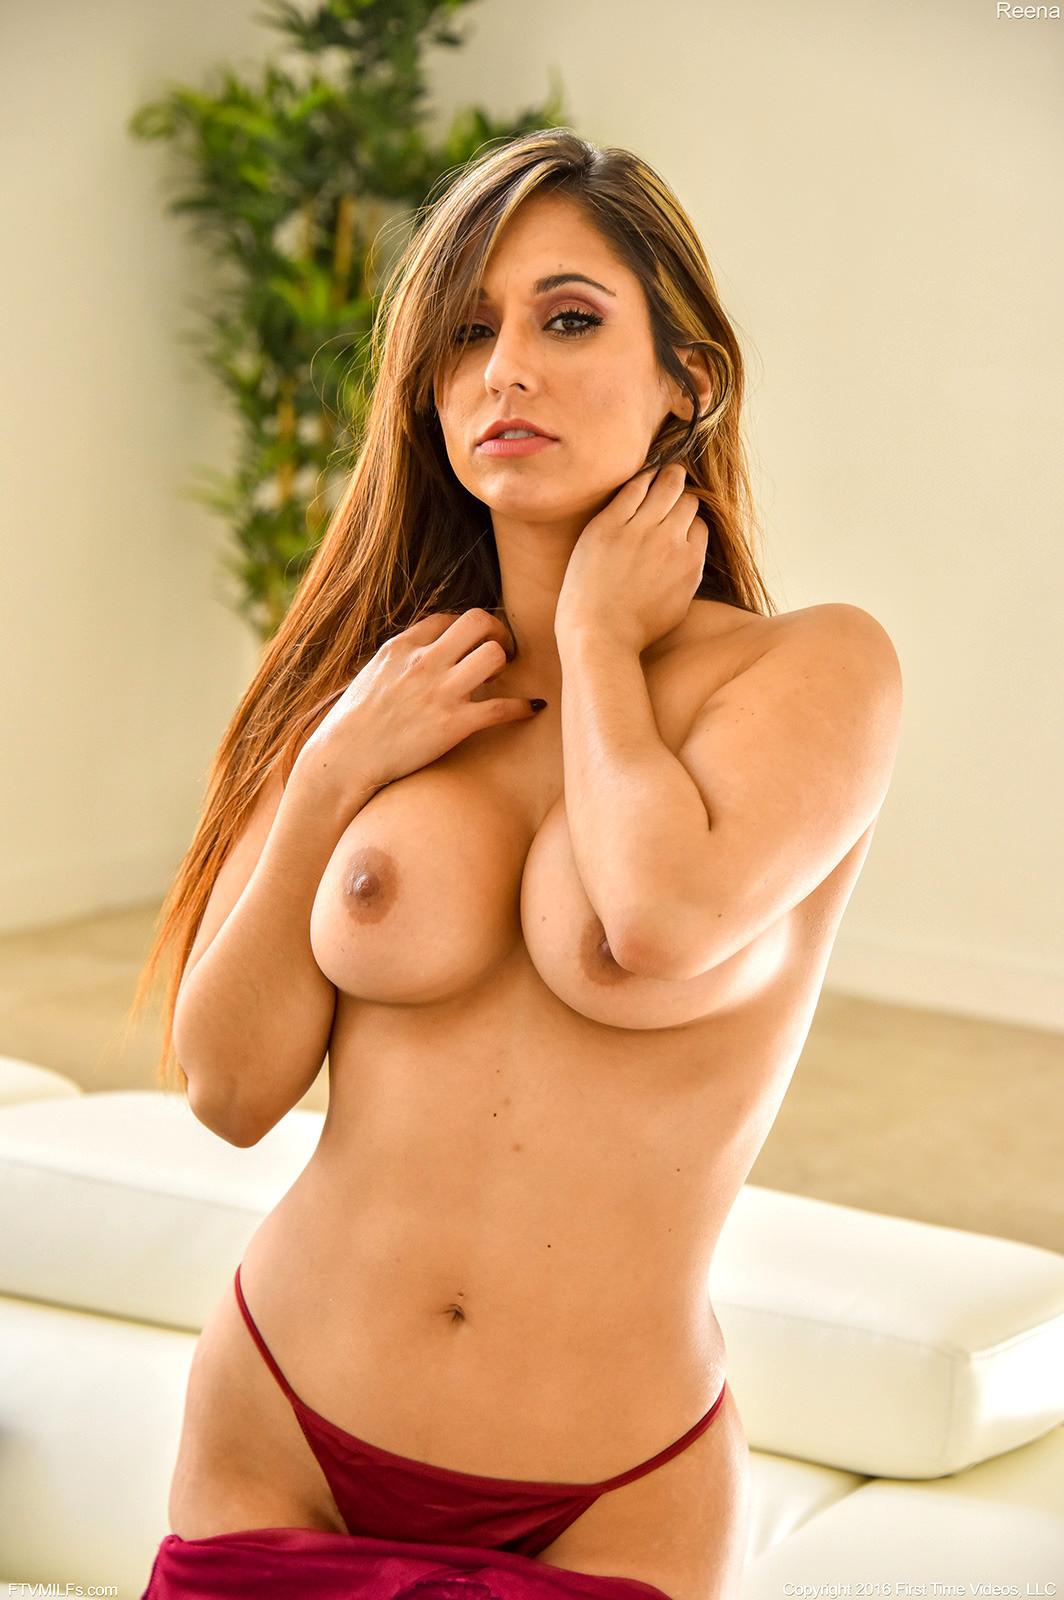 Ftv Milfs Reena Sky Sexy Dildo Xxx Dvd Sex Hd Pics-2688